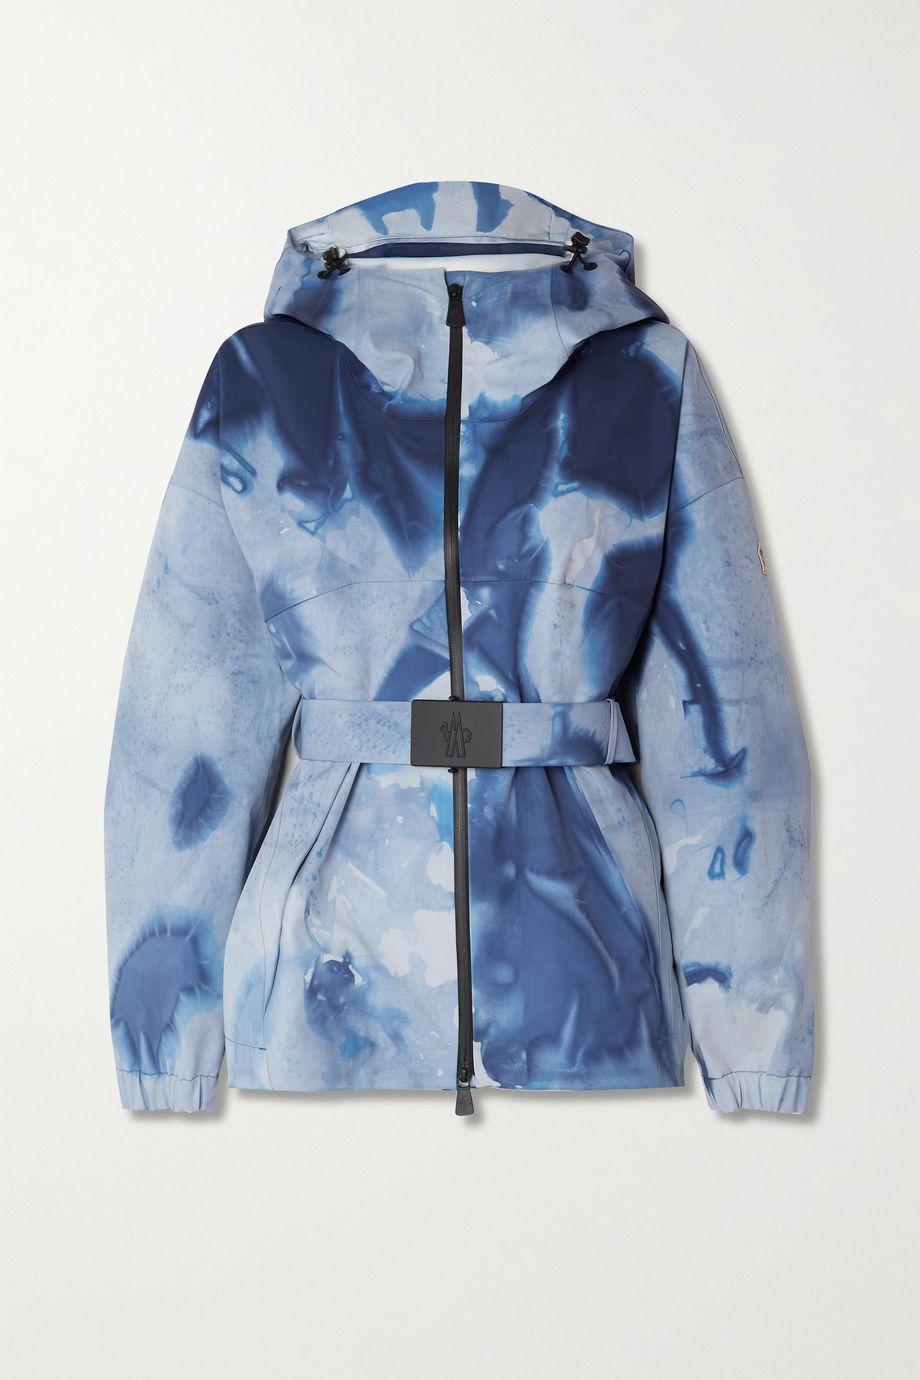 Moncler Genius Hooded belted tie-dyed ski jacket